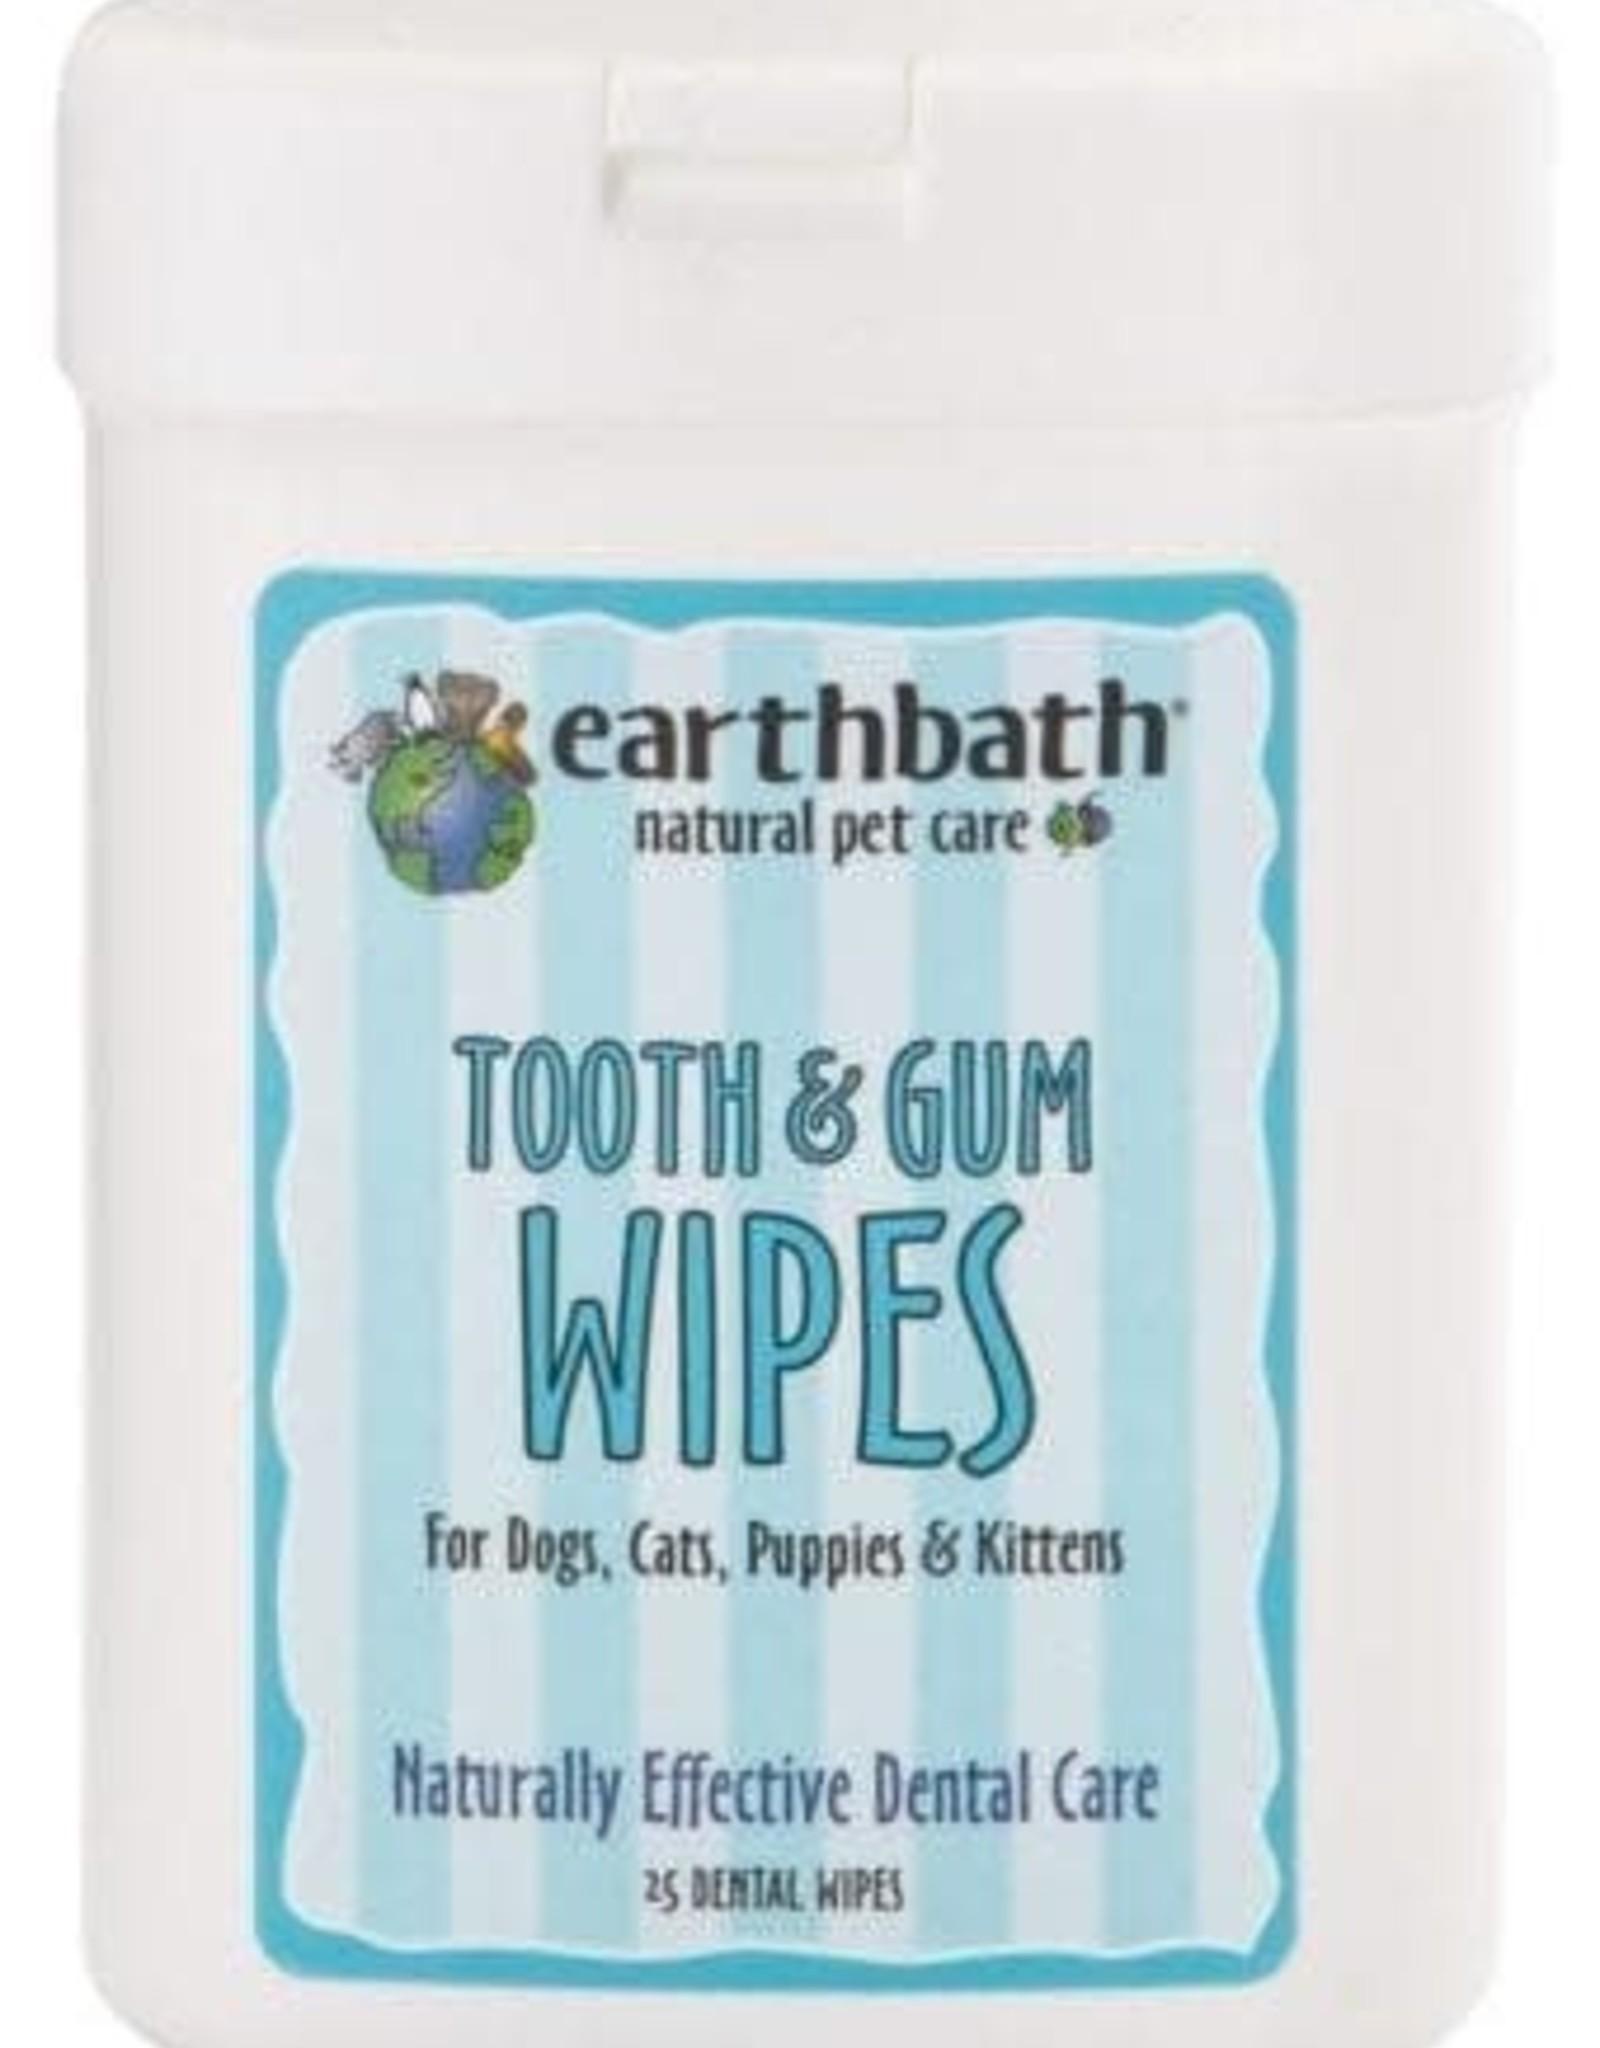 Earthbath Earthbath Tooth & Gum Wipes